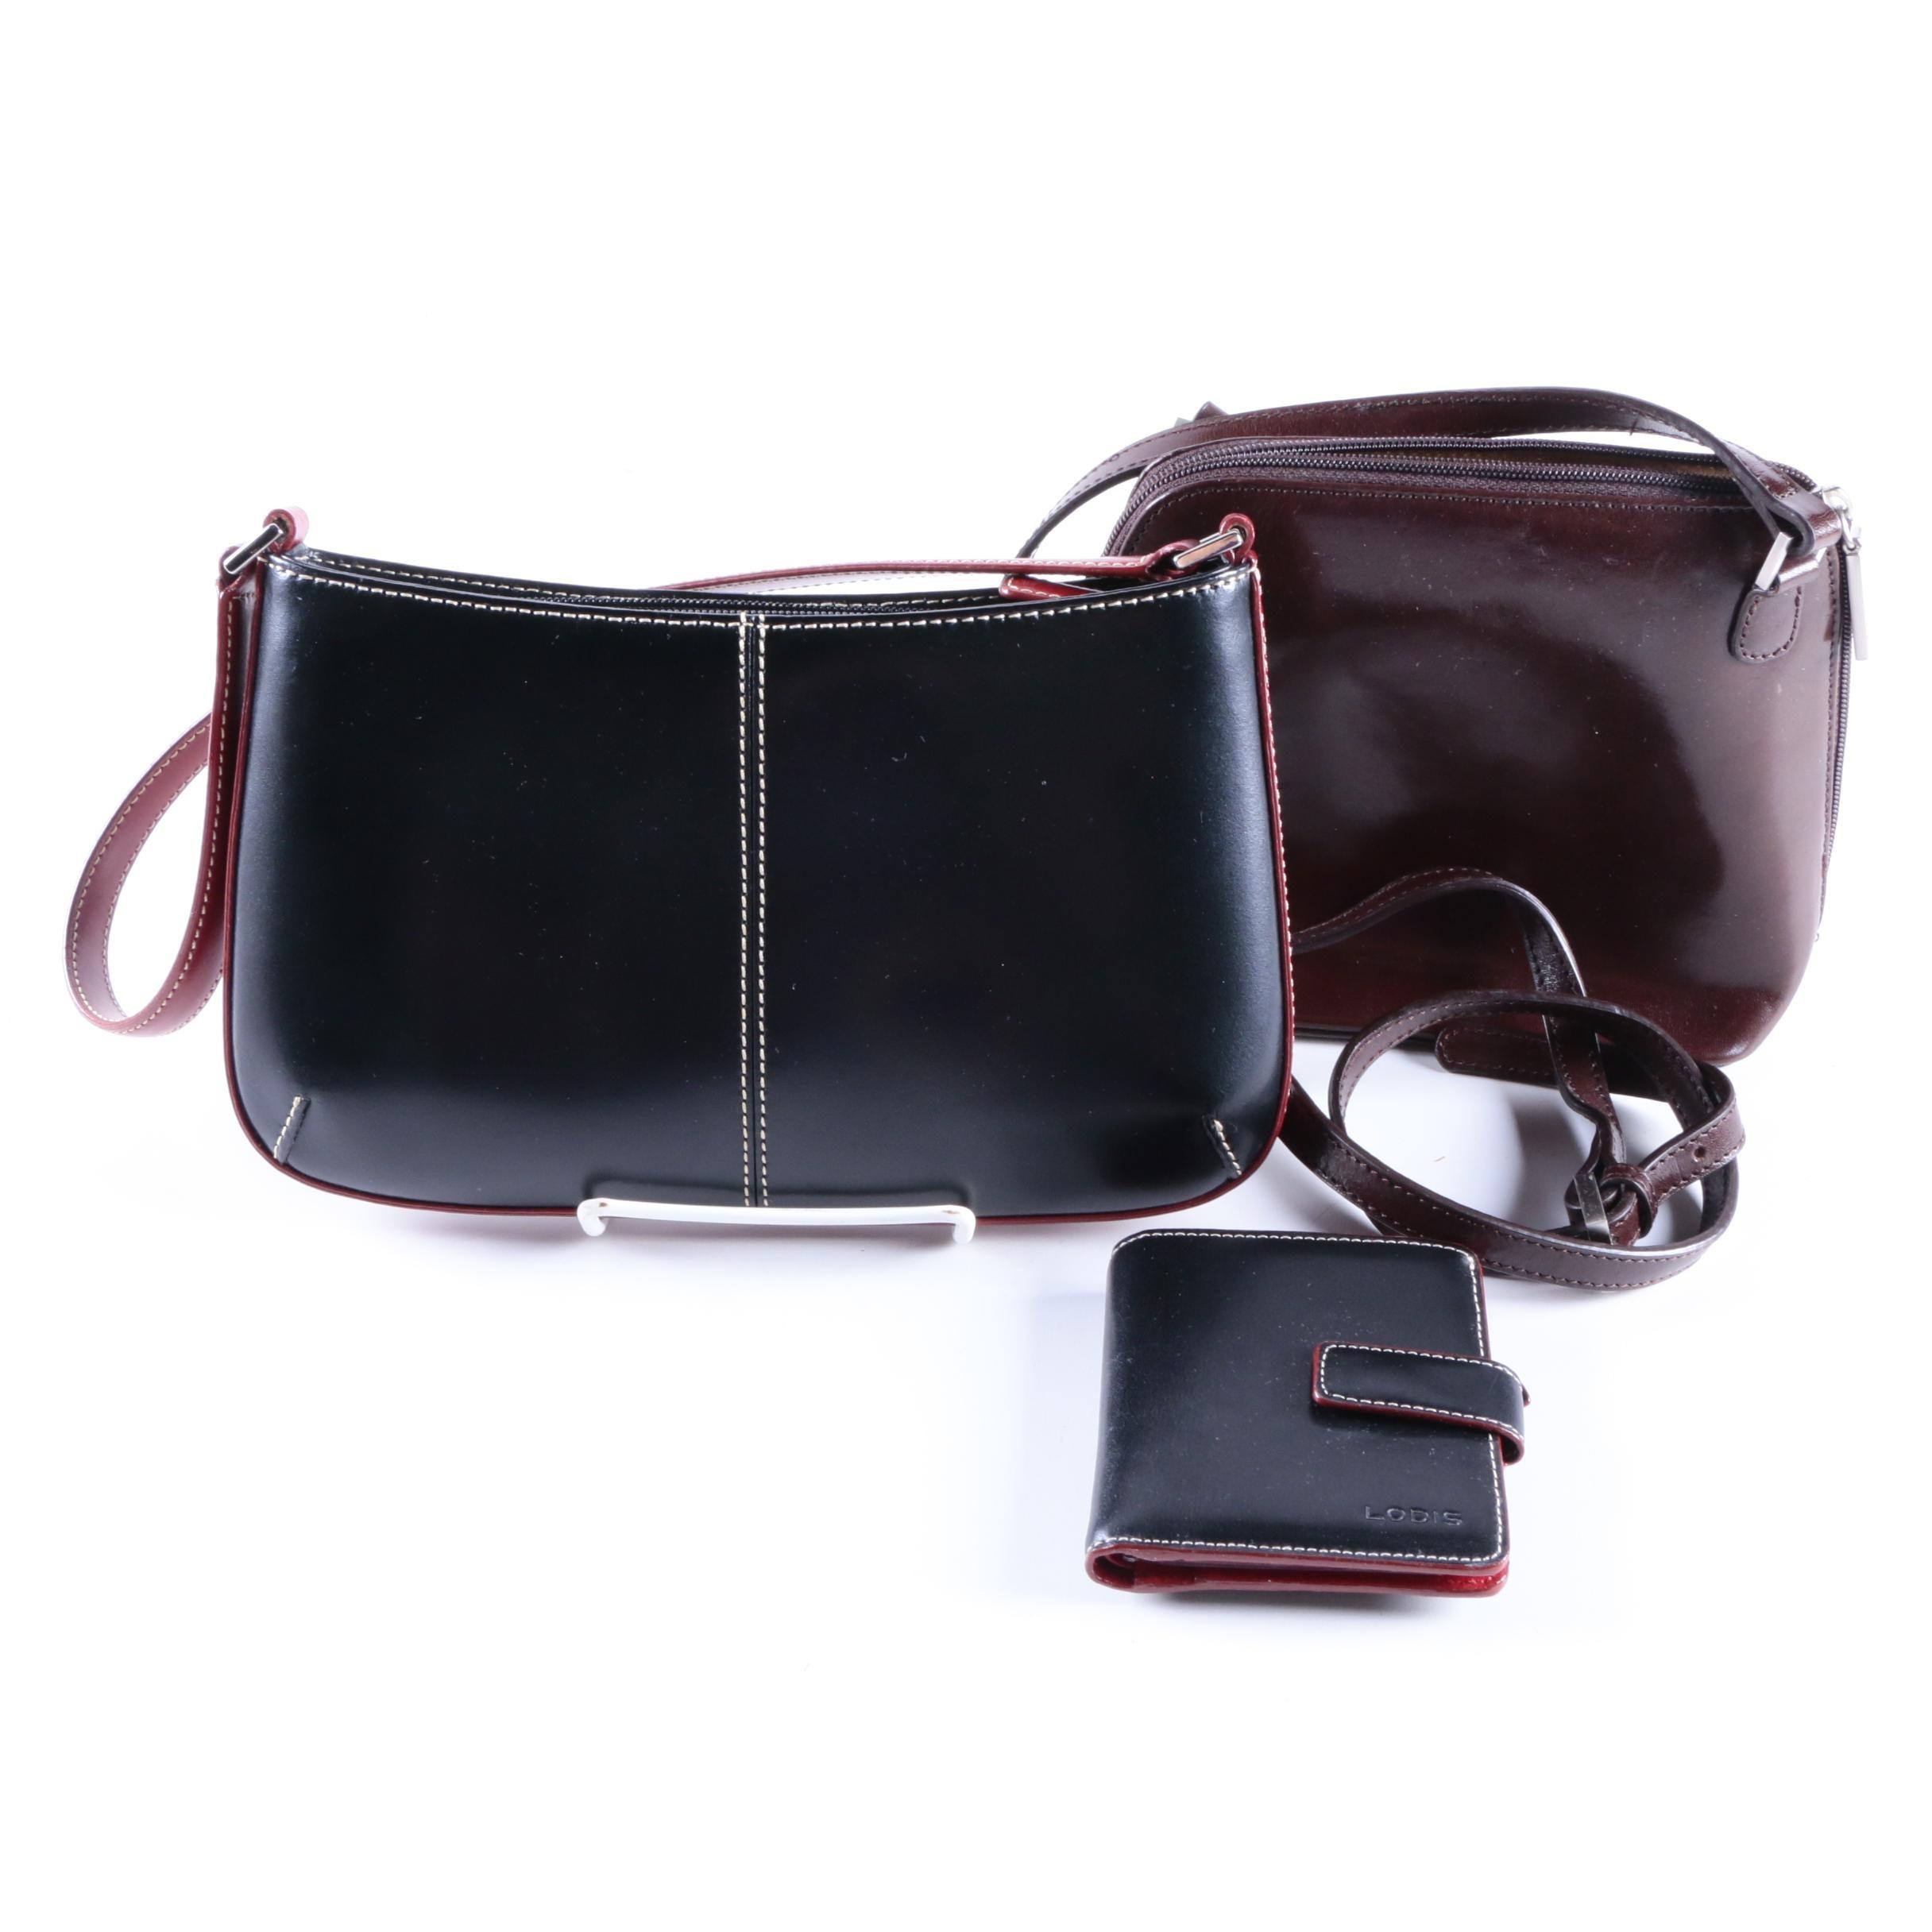 Leather Handbags Including Hobo International